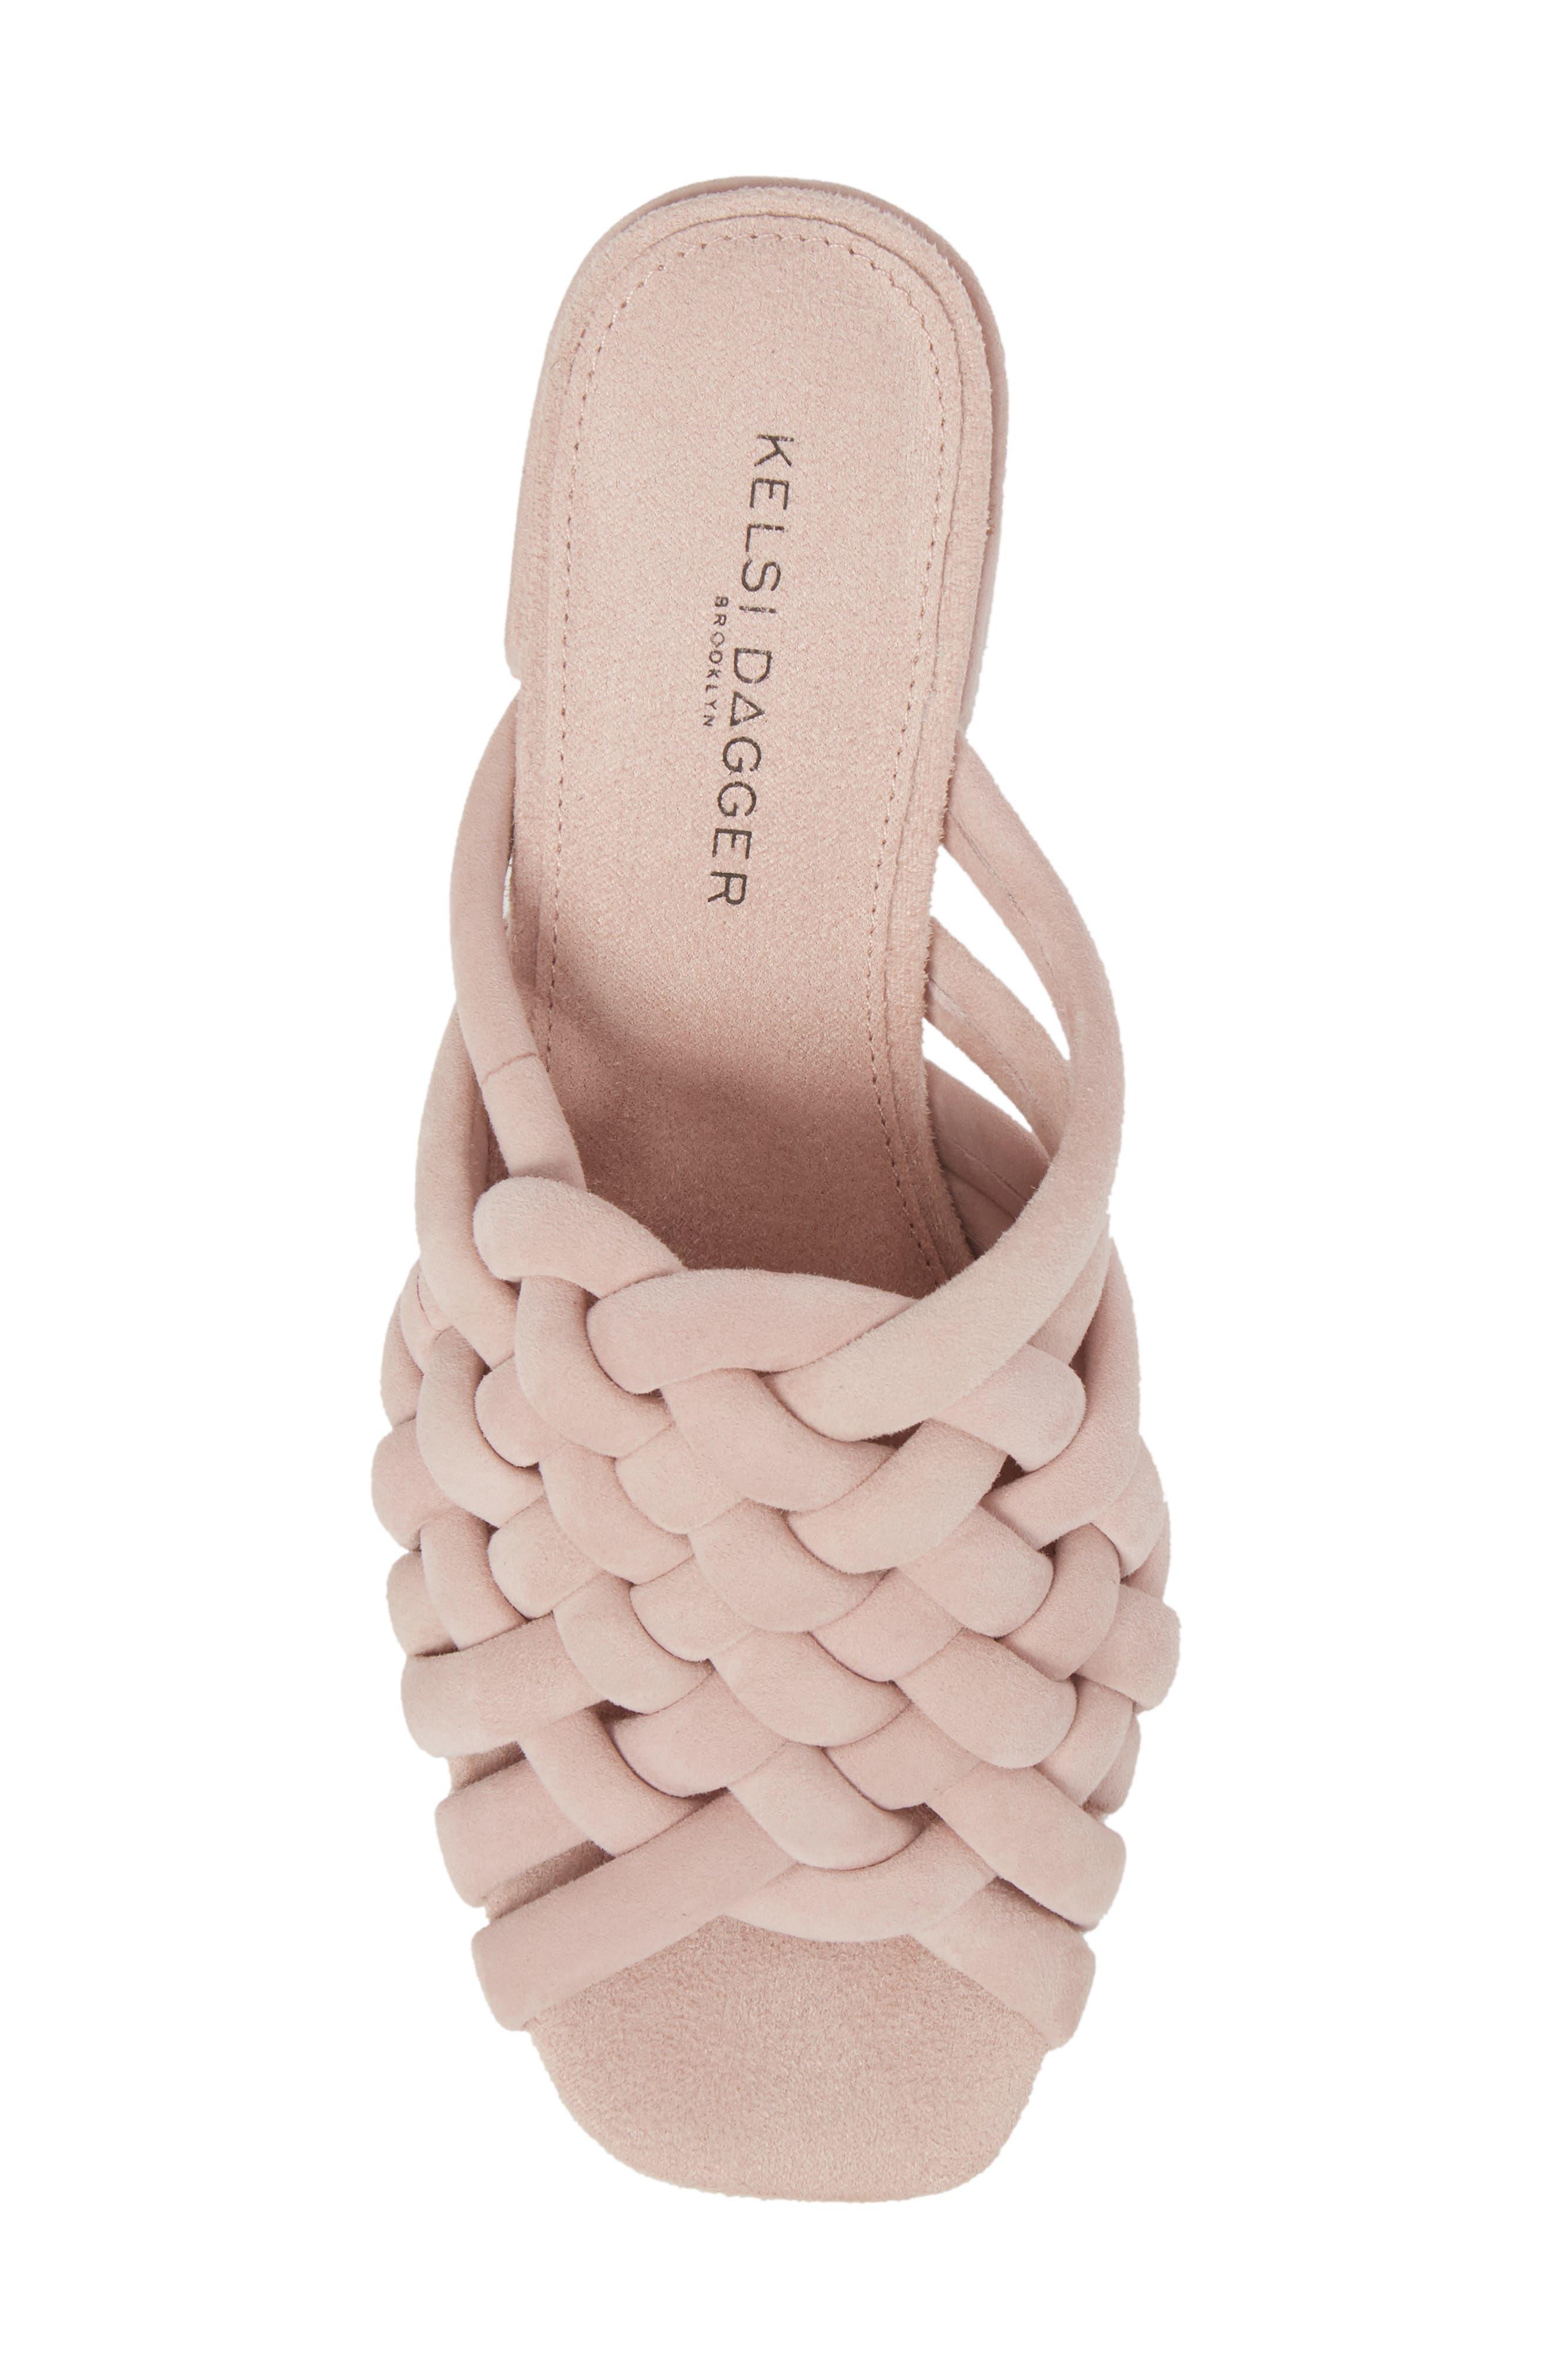 Sky Dress Woven Mule Sandal,                             Alternate thumbnail 5, color,                             Pale Pink